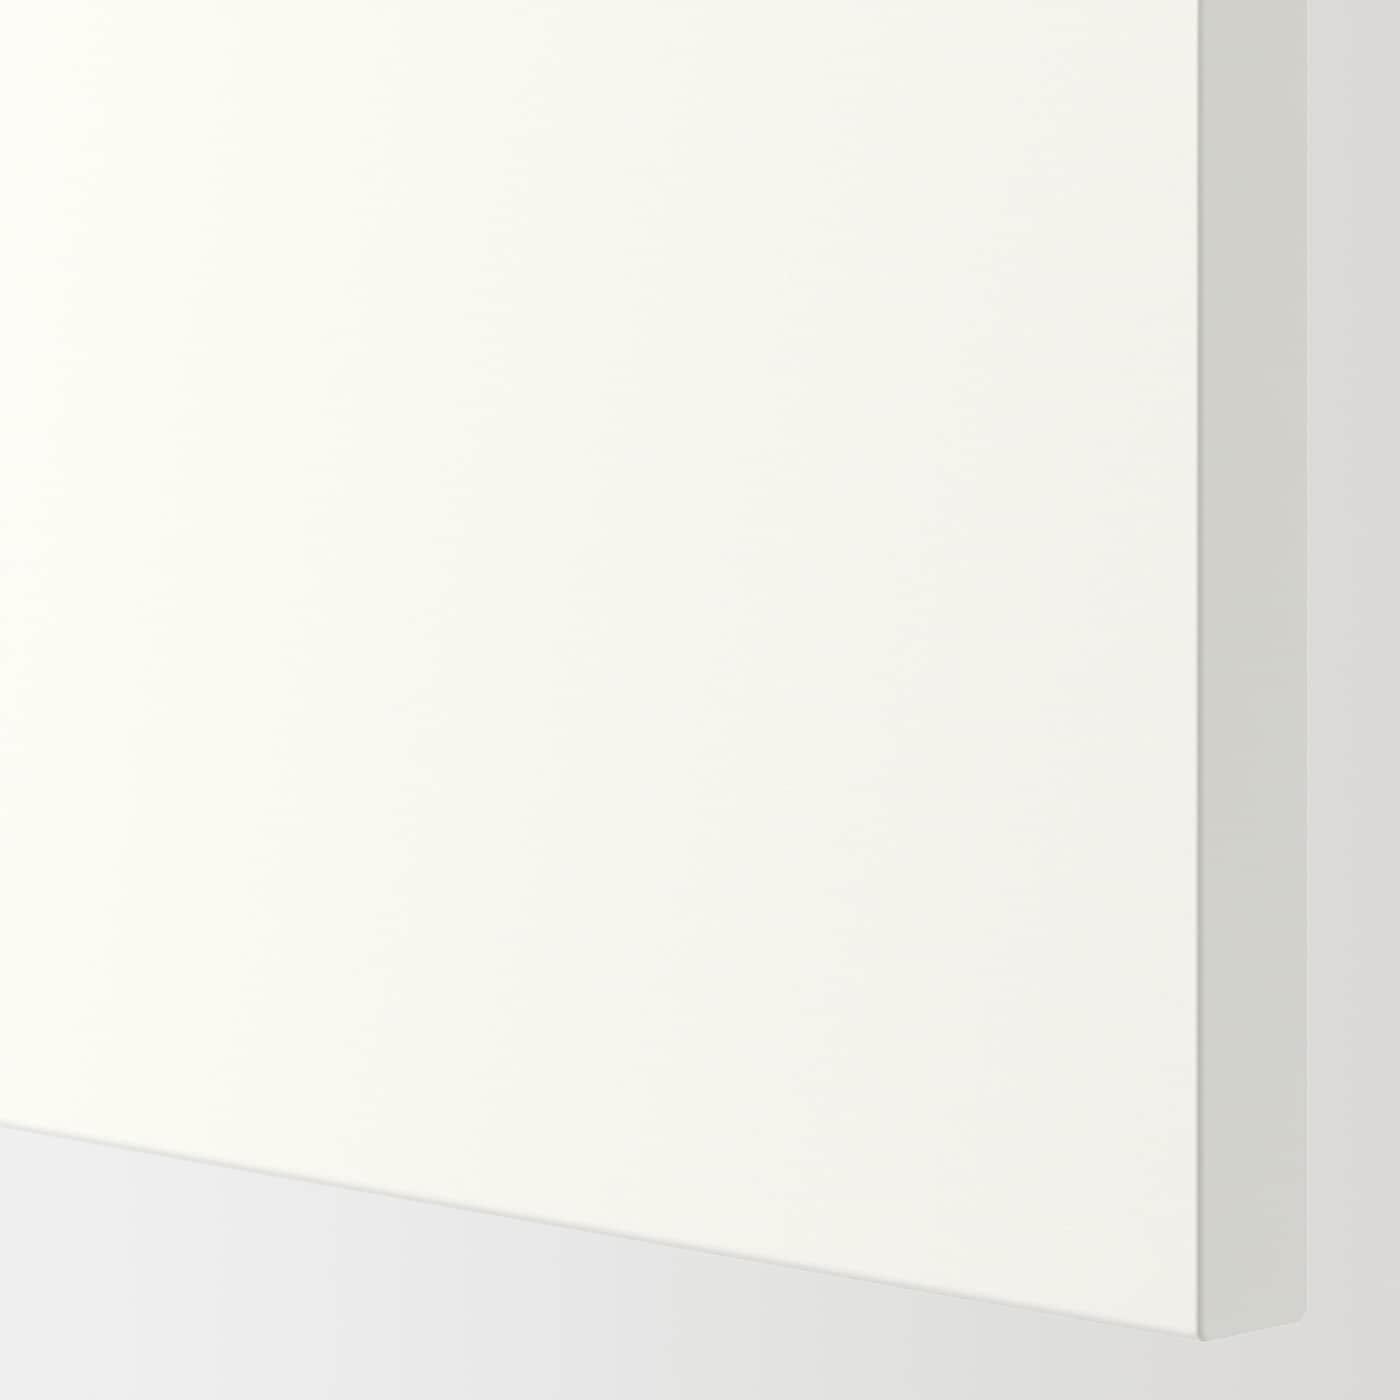 ENHET خ. قاعدة لفرن مع درج, أبيض, 60x62x75 سم